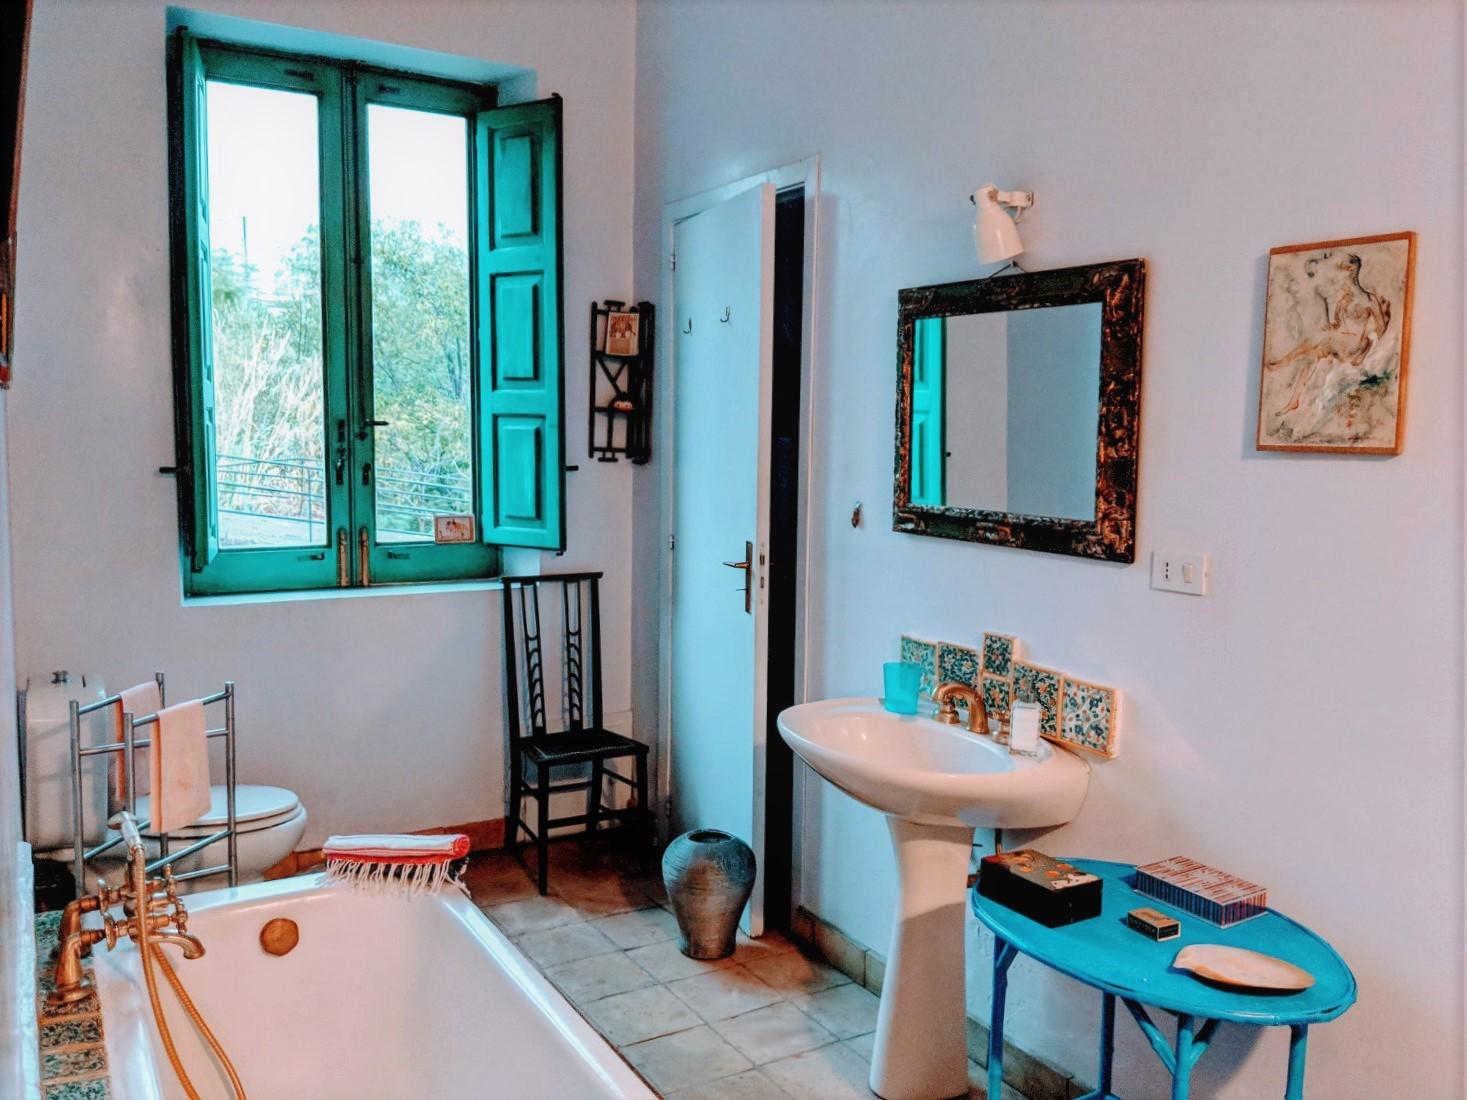 63 bathroom blue landscape 3 villa ama sicily.jpg